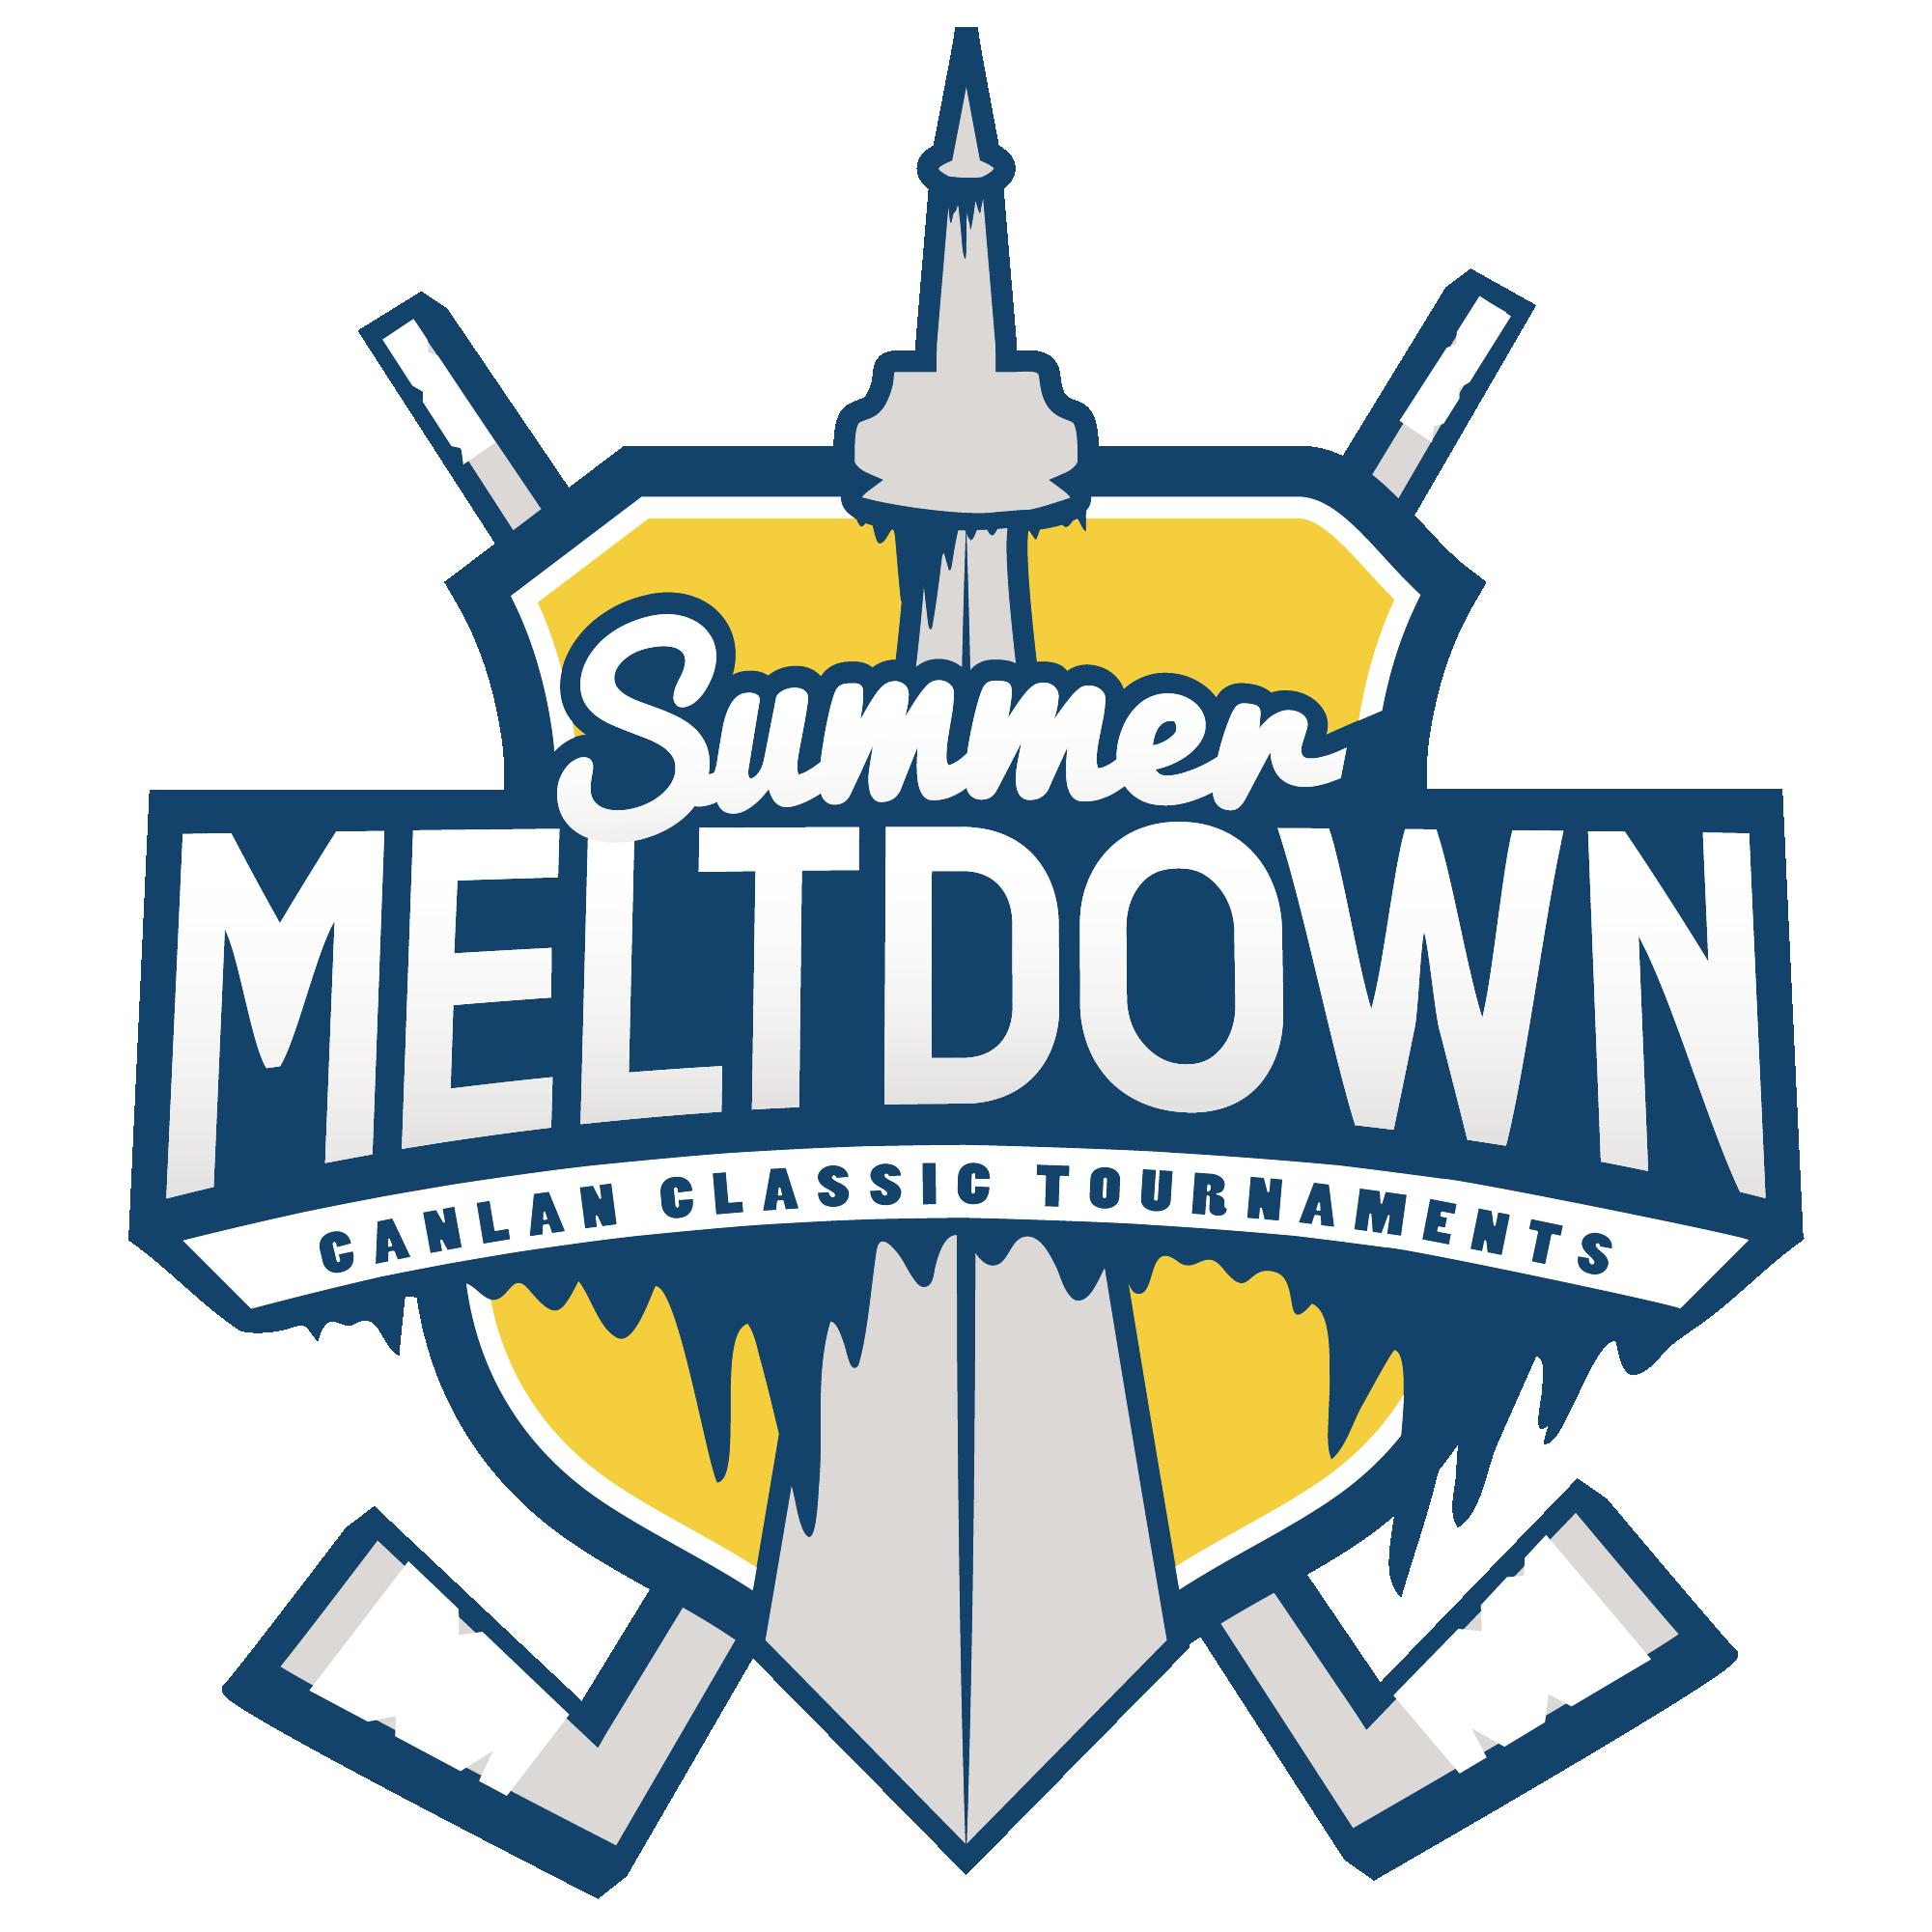 Hockey clipart hockey tournament. Summer meltdown cct